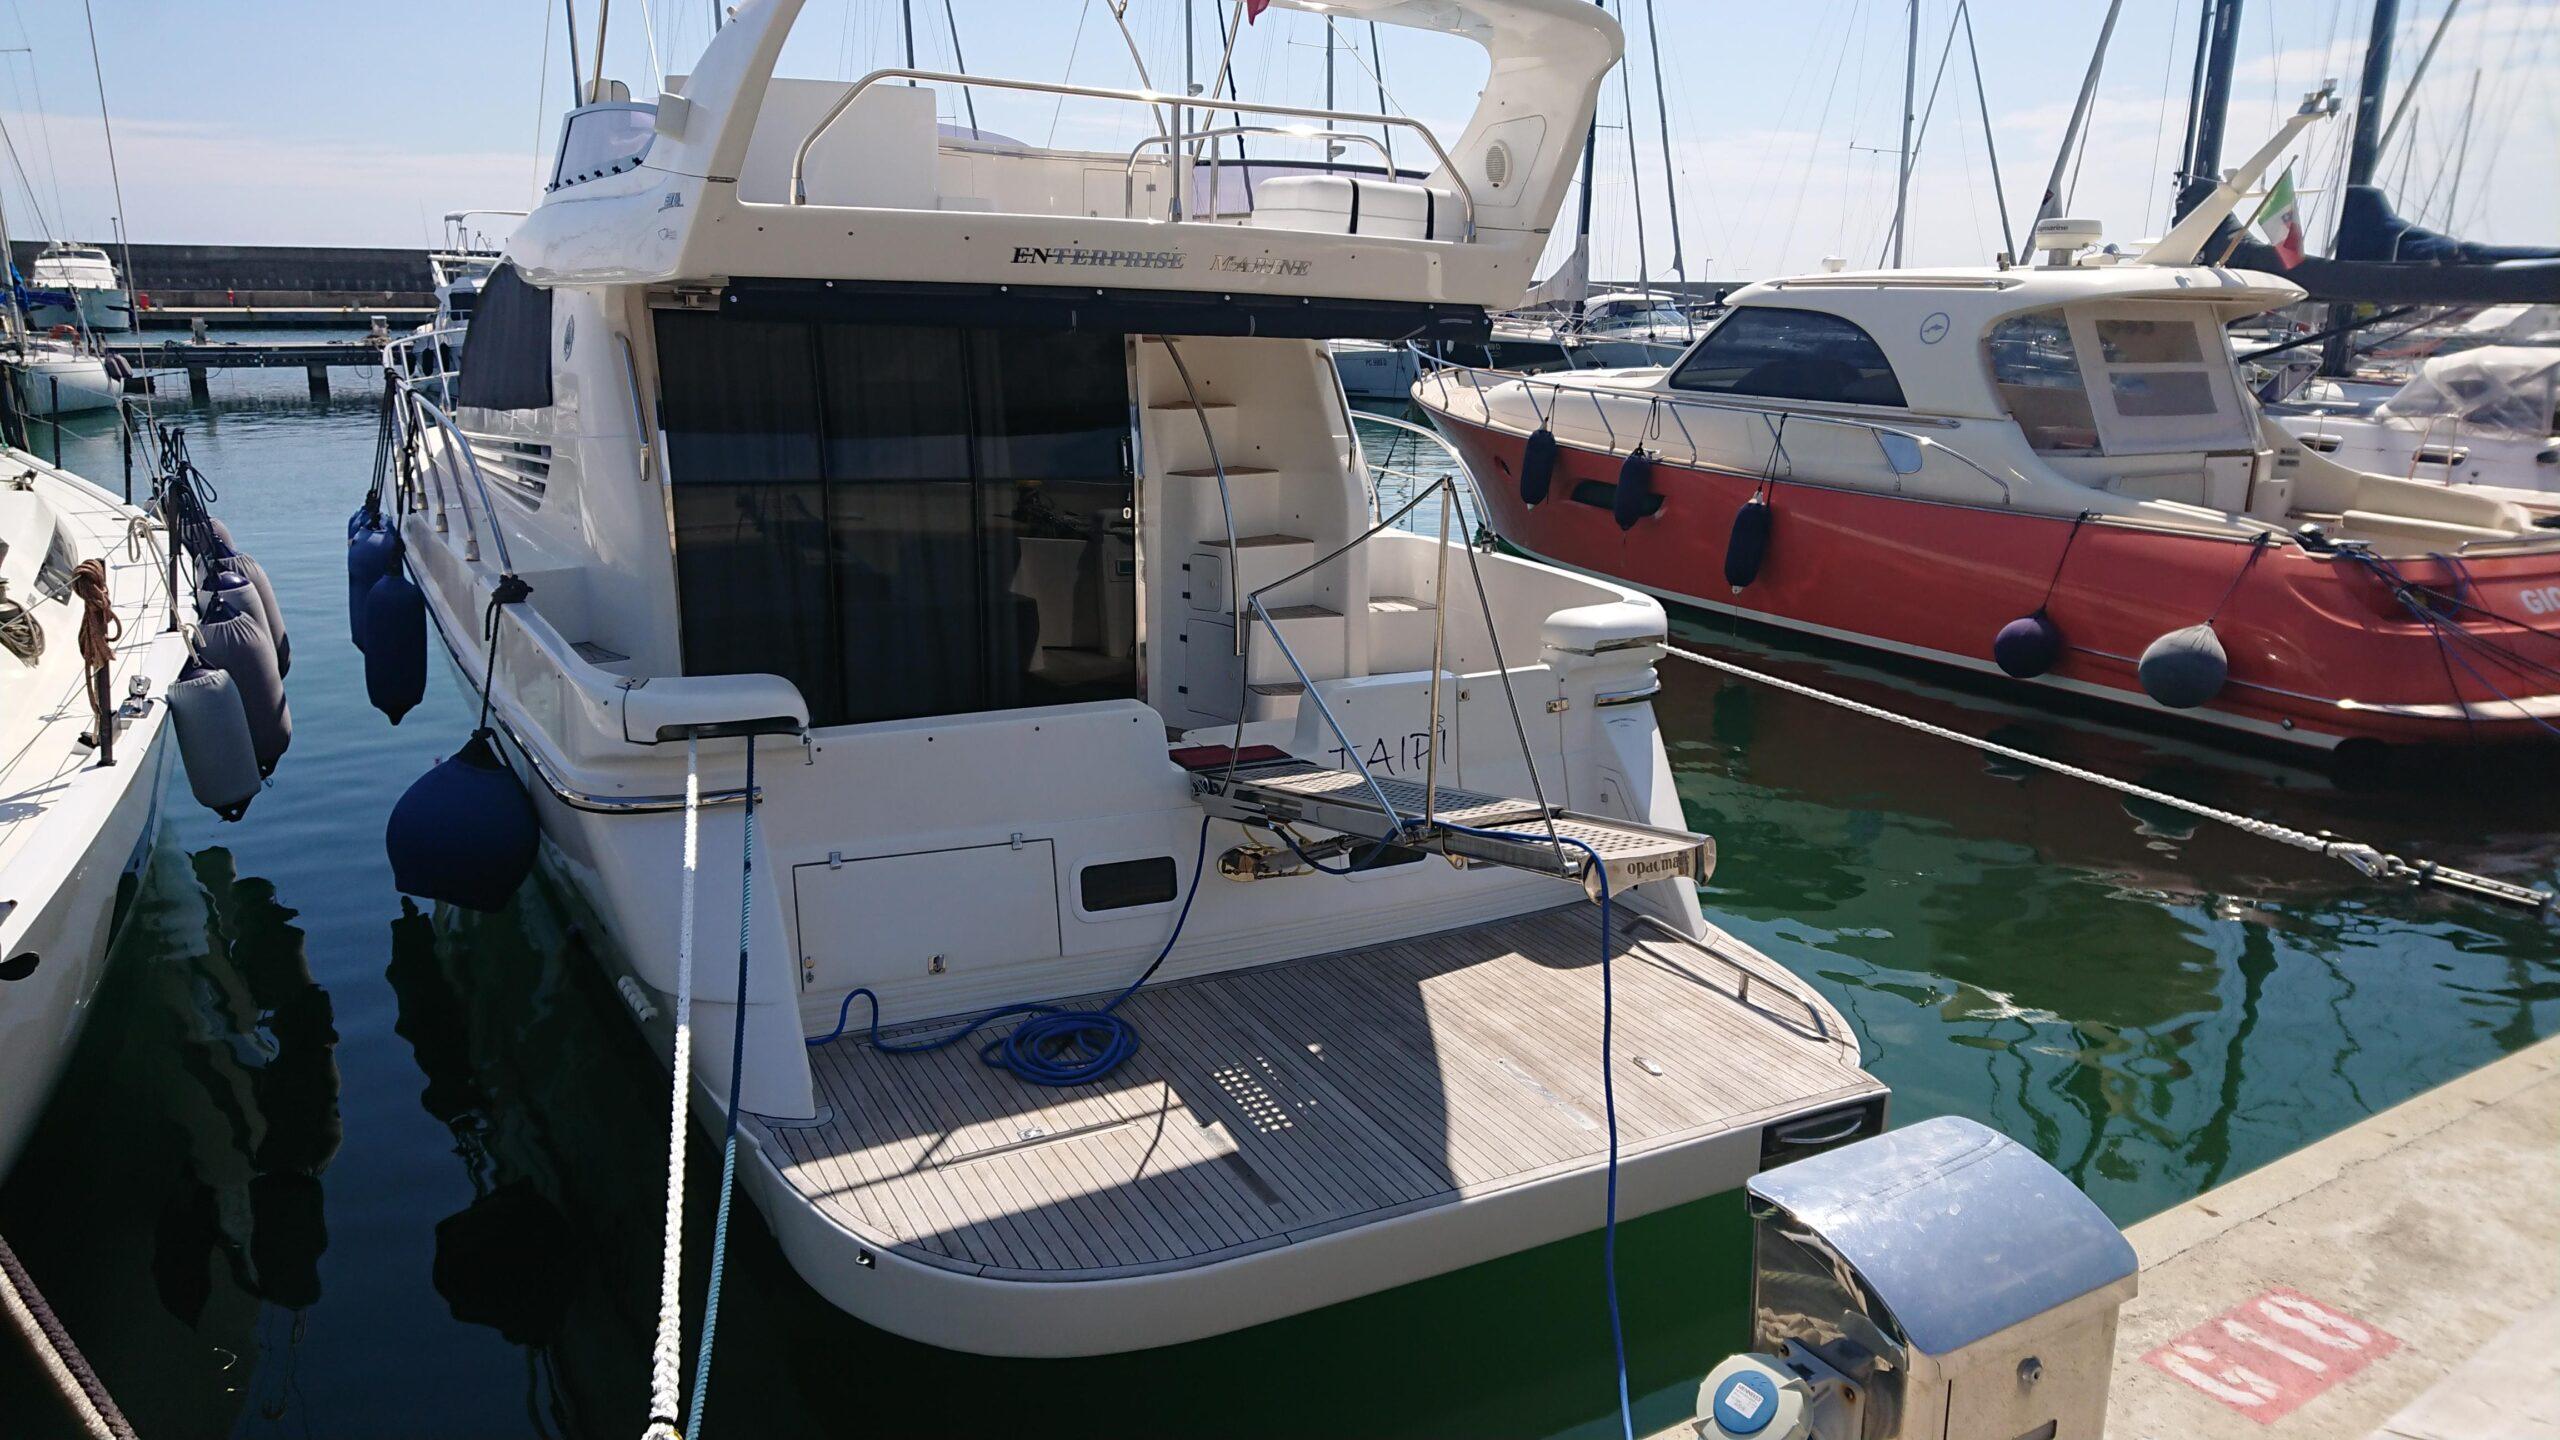 Meilentörns Motorboot Aussen 2